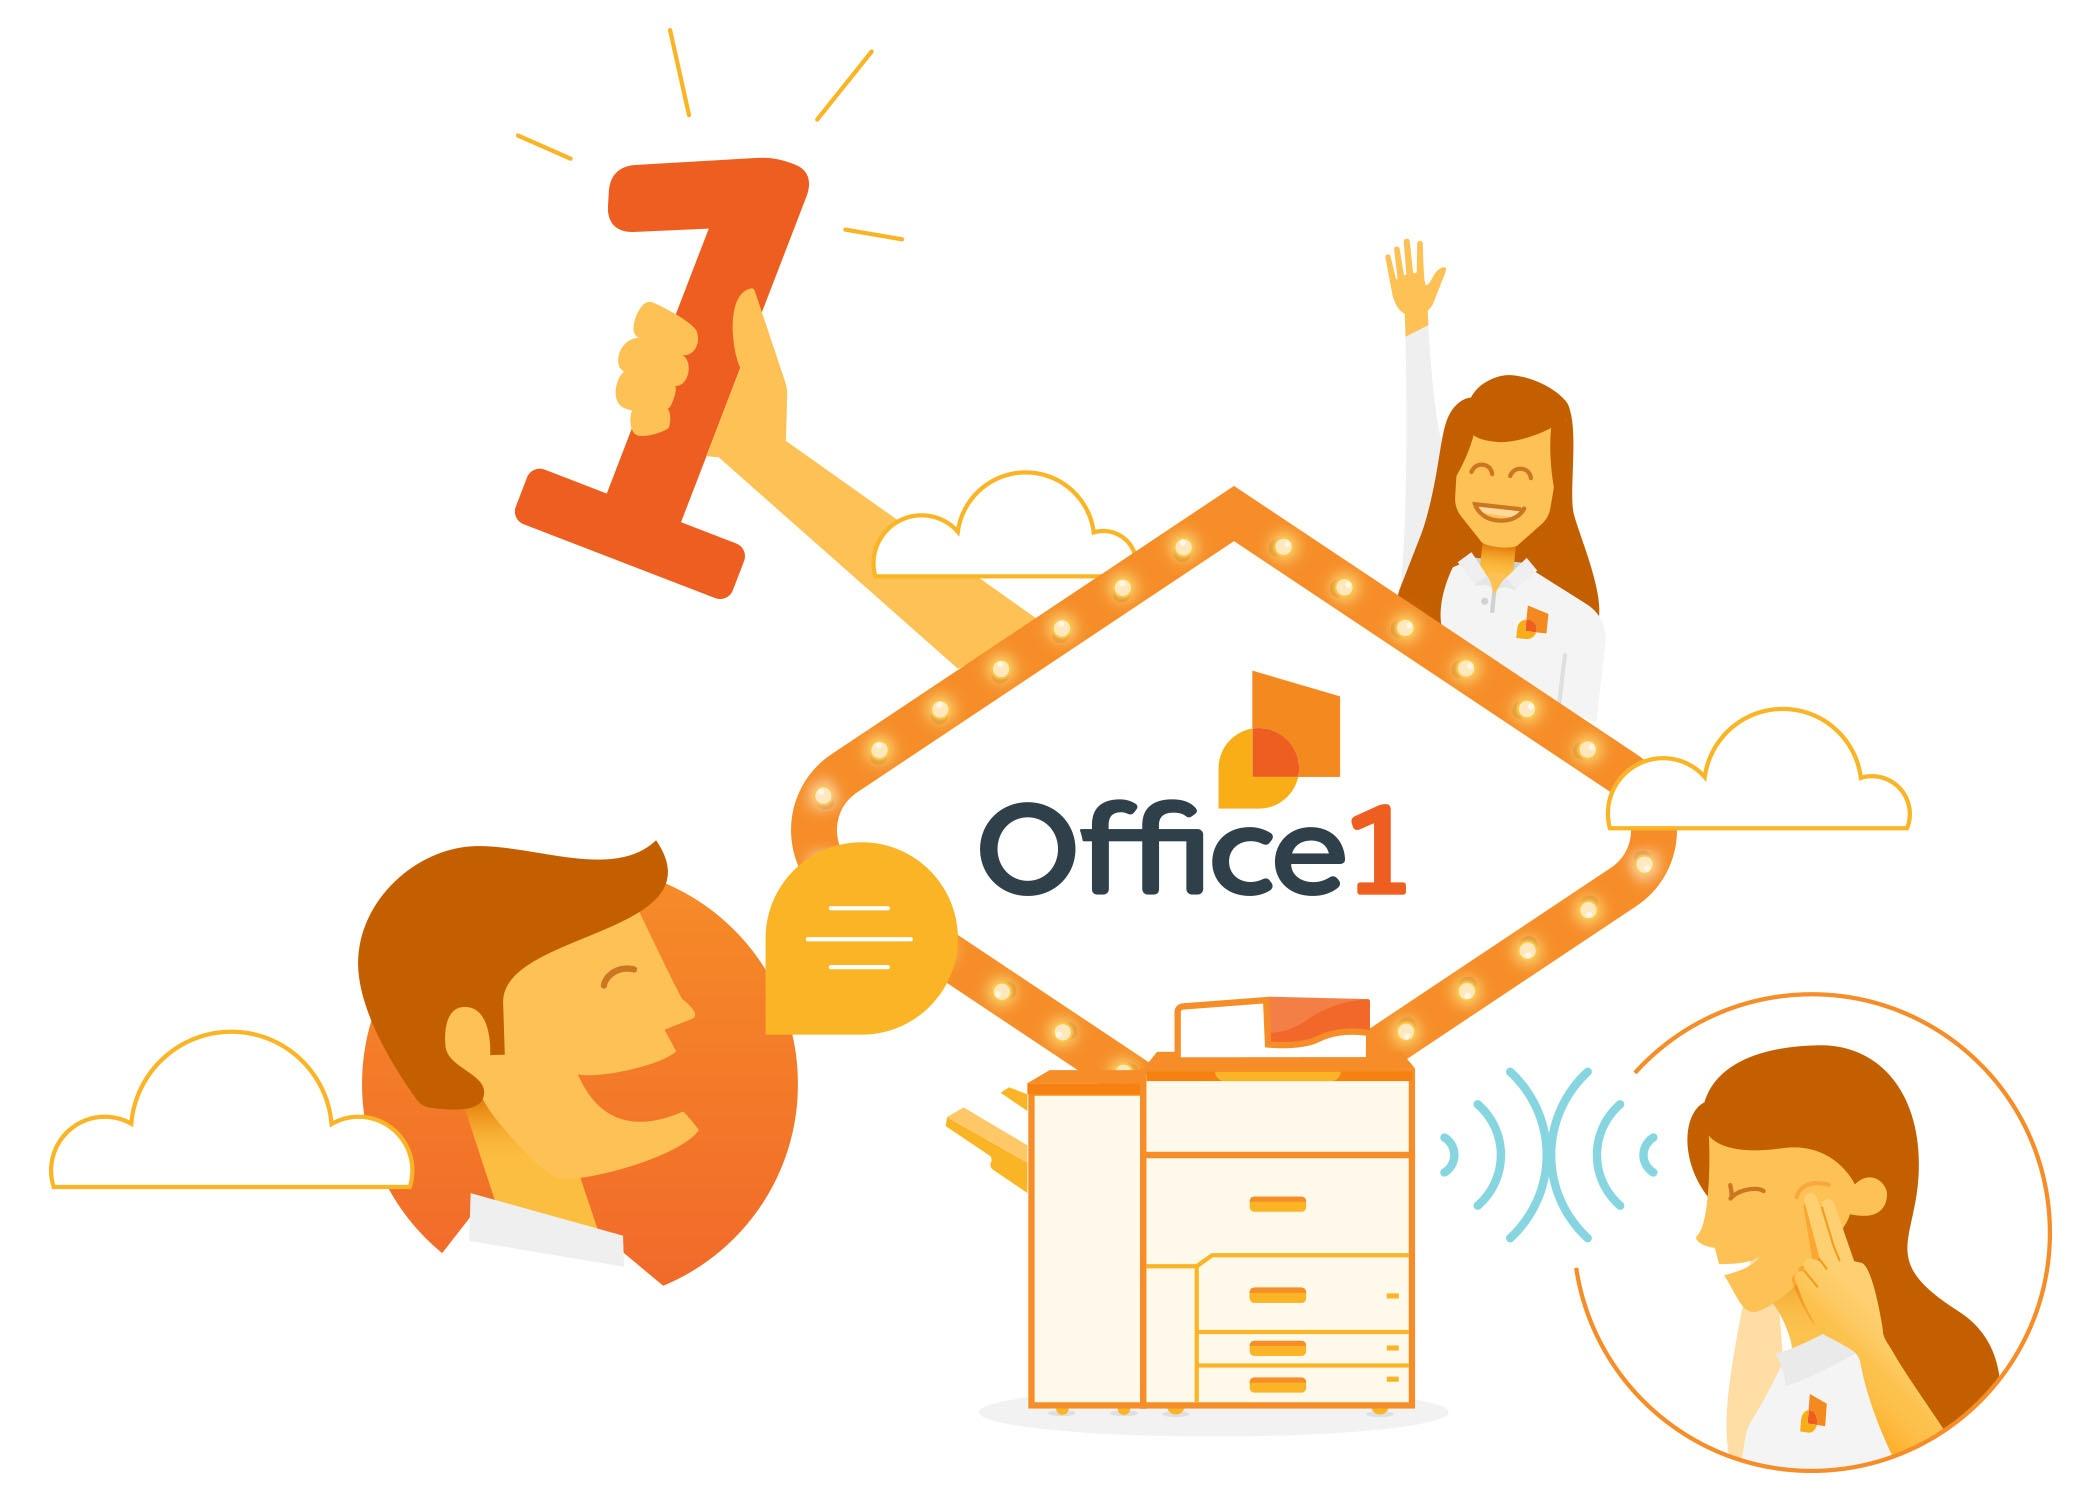 Culture - Office1